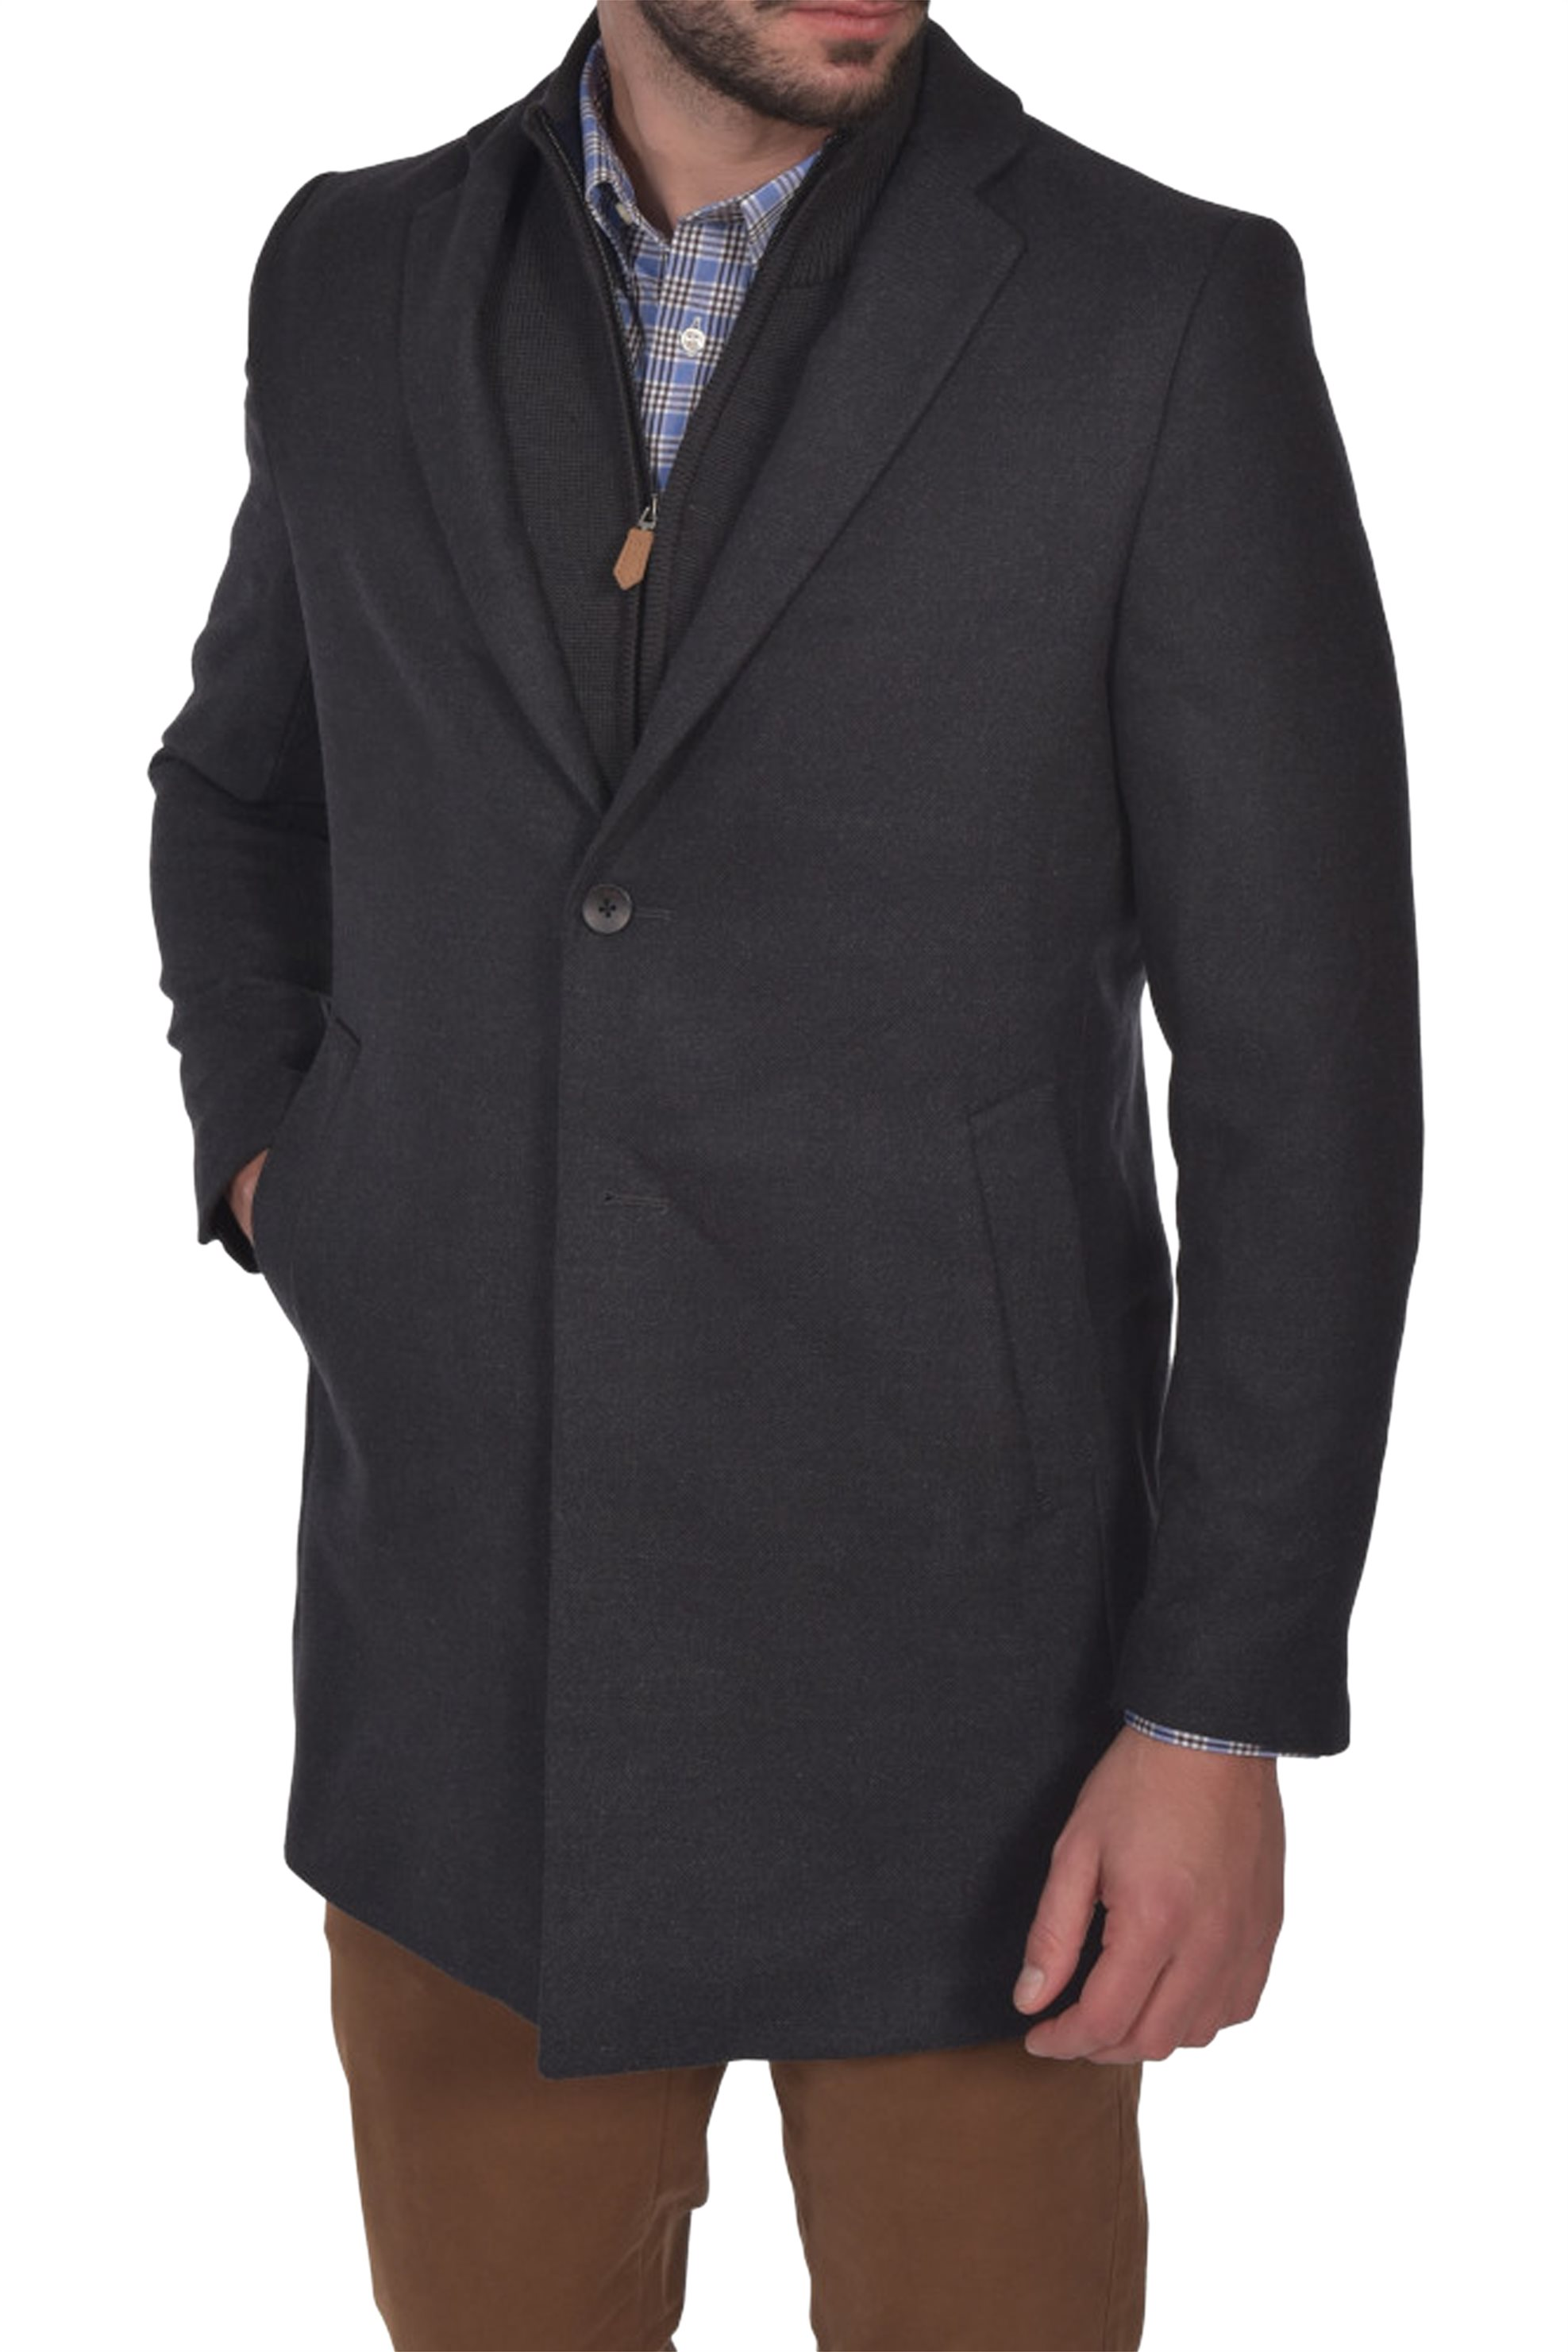 Dur ανδρικό μάλλινο παλτό μονόχρωμο Diagonal - 52200042 - Ανθρακί